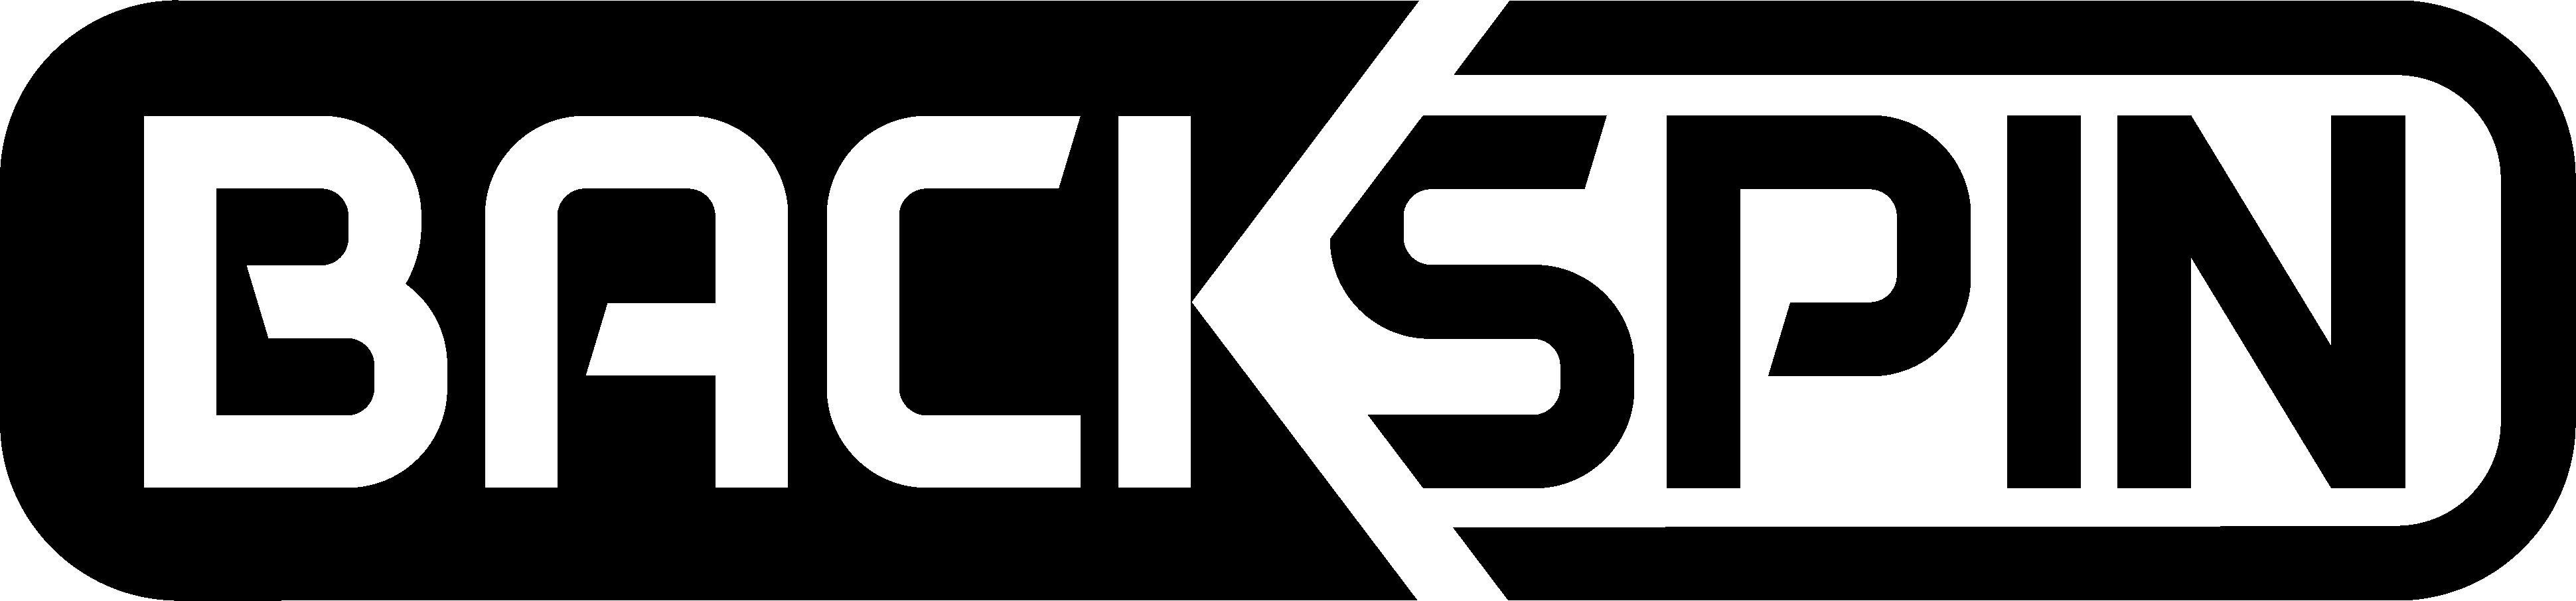 BackSpin_Logo_Black